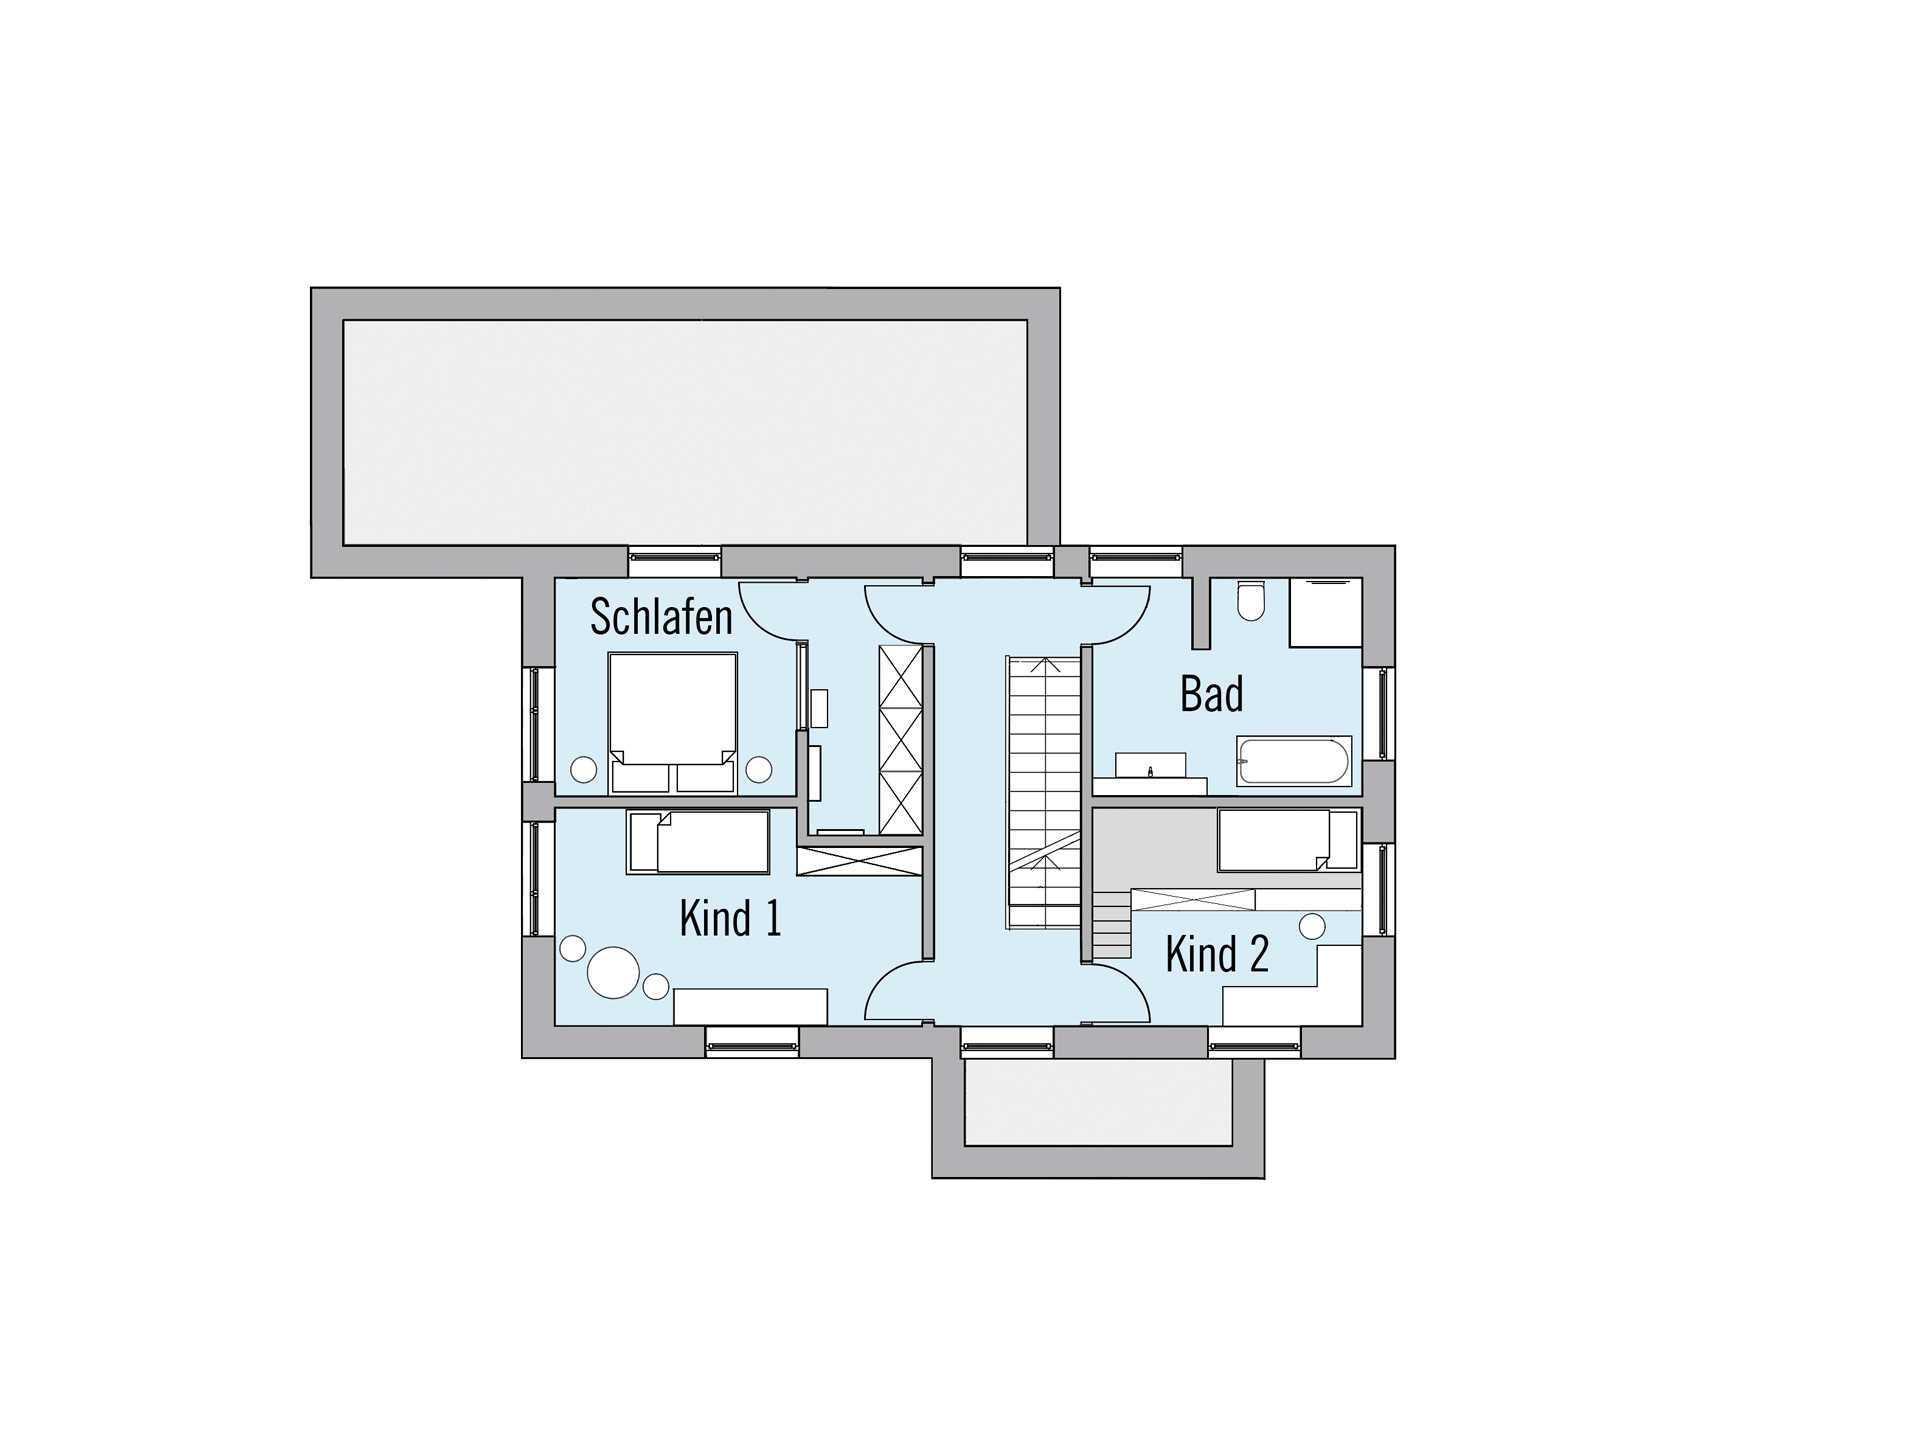 Naturdesign - Bau-Fritz GmbH & Co. KG, seit 1896